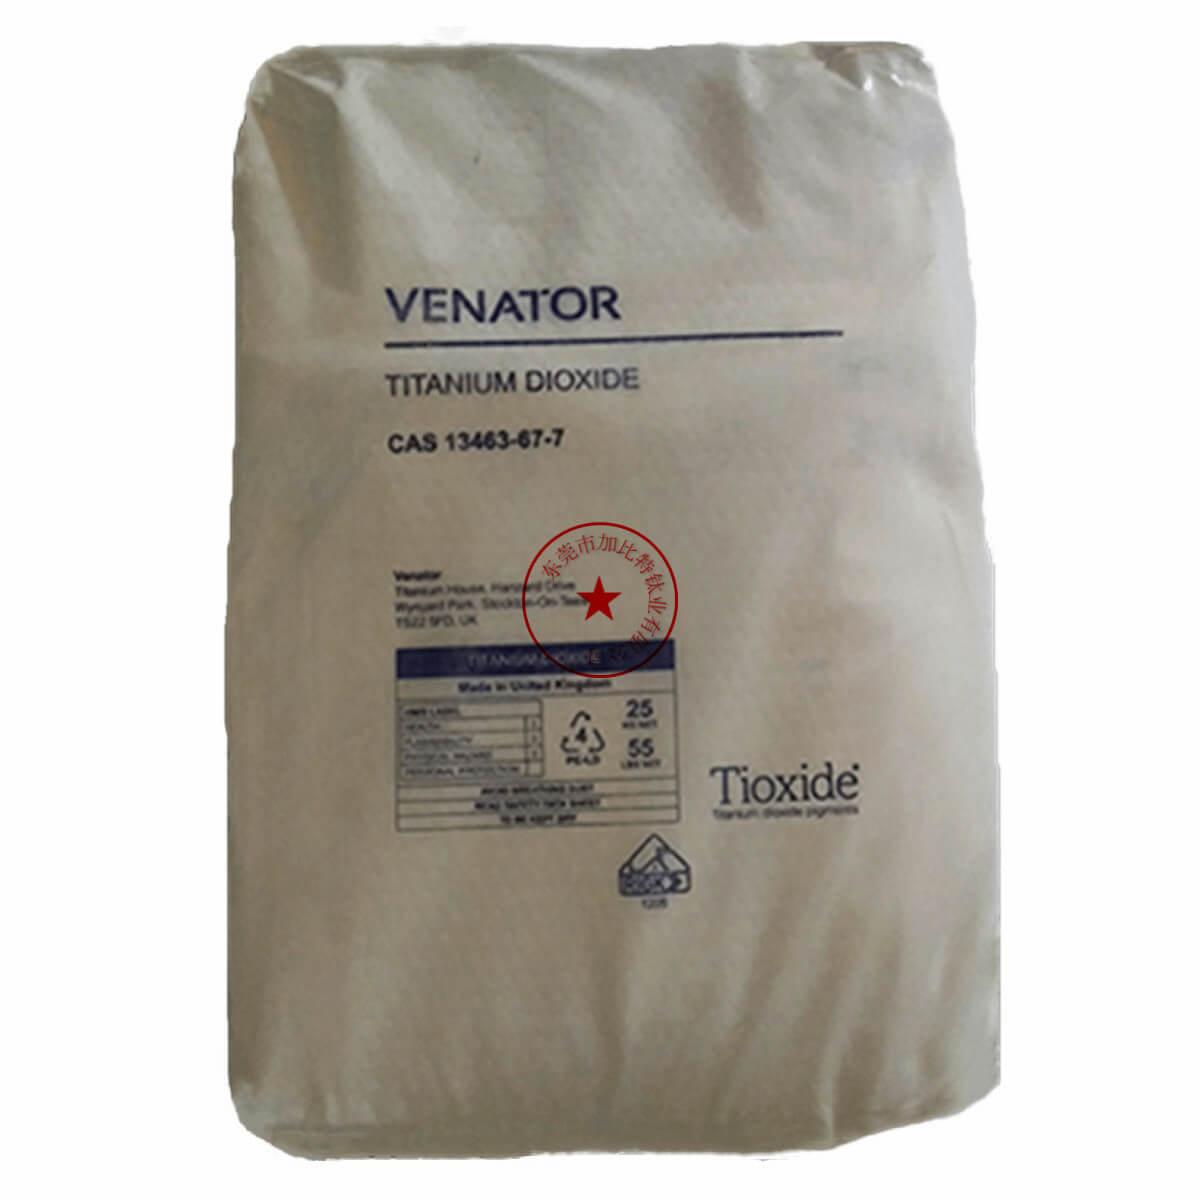 Venator 亨斯迈R-TC30塑料用钛白粉 白度好 易分散 高遮盖